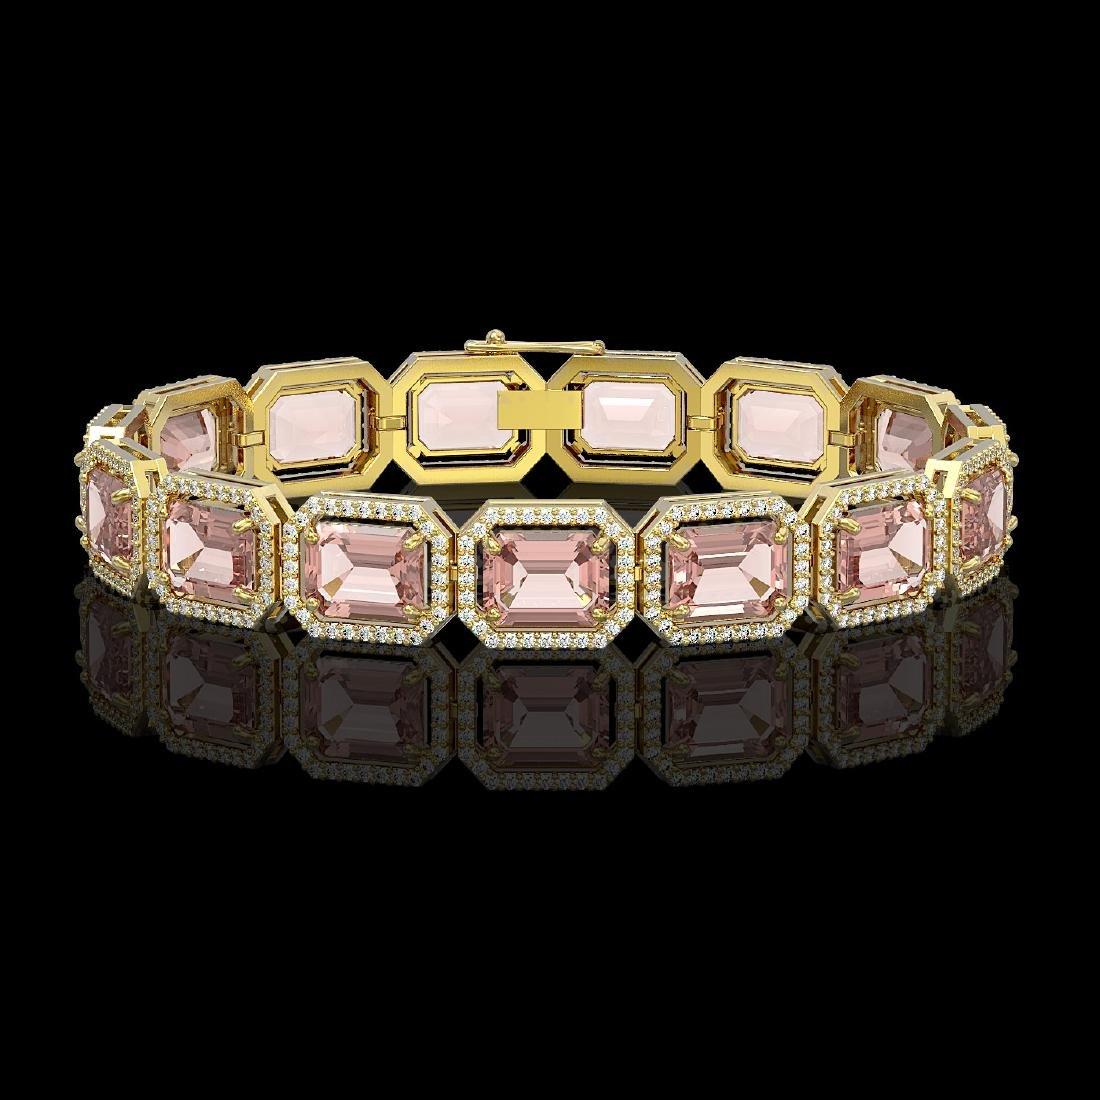 37.11 CTW Morganite & Diamond Halo Bracelet 10K Yellow